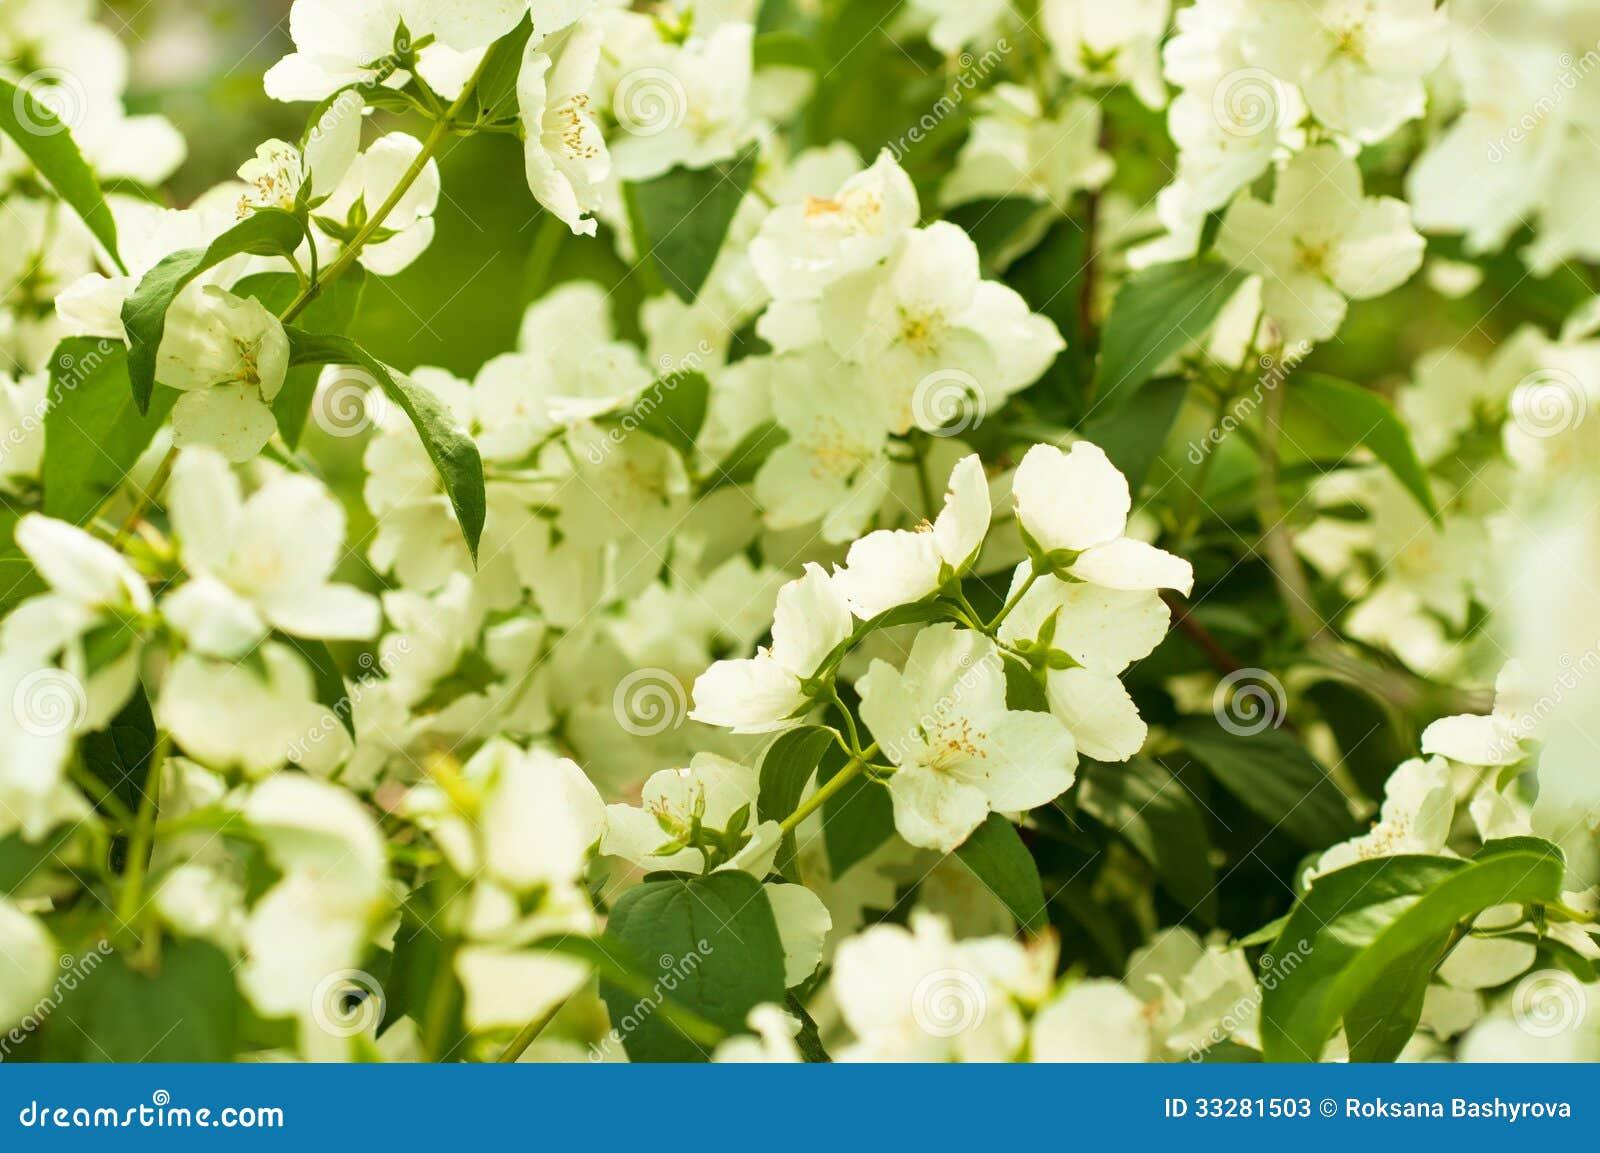 Jasmine Flower Stock Image Image Of Macro Elegance 33281503